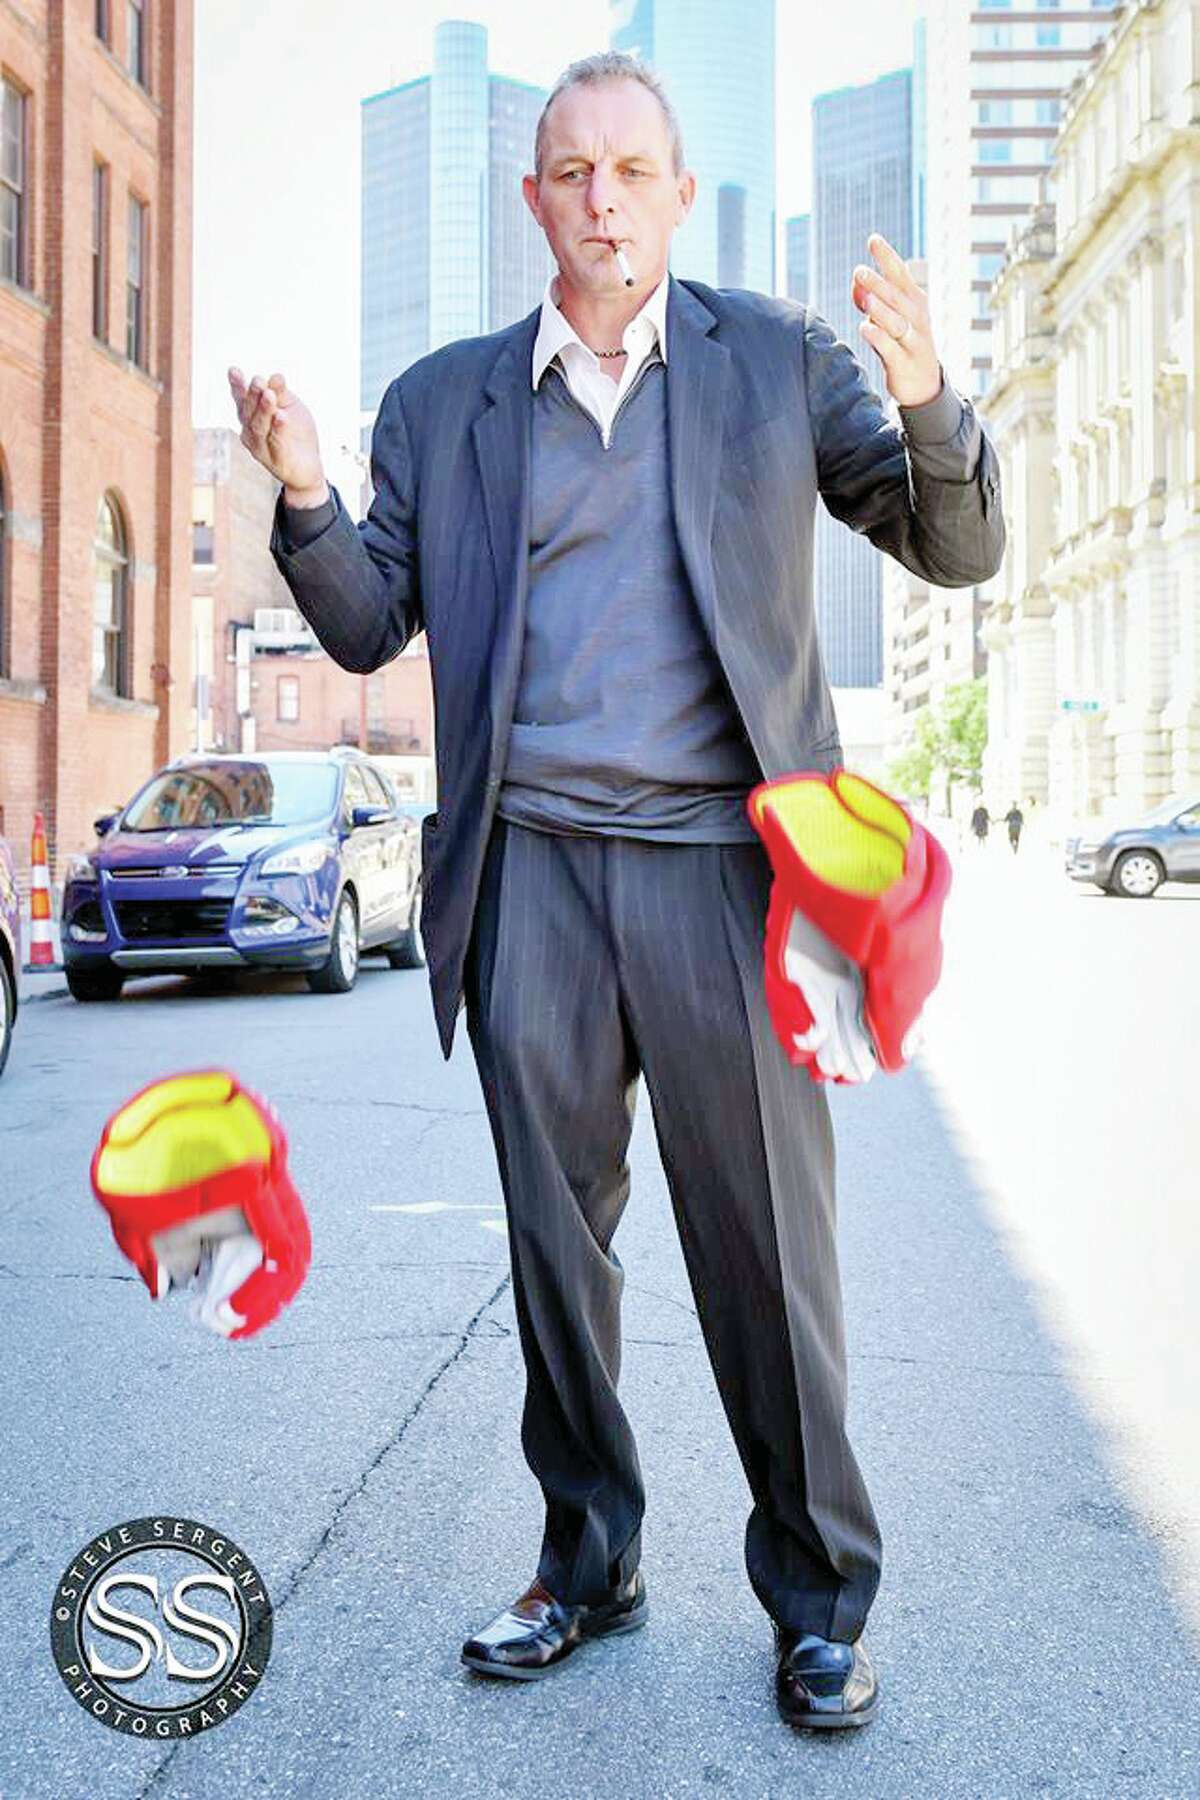 Darren McCarty's Slapstick Comedy Tour